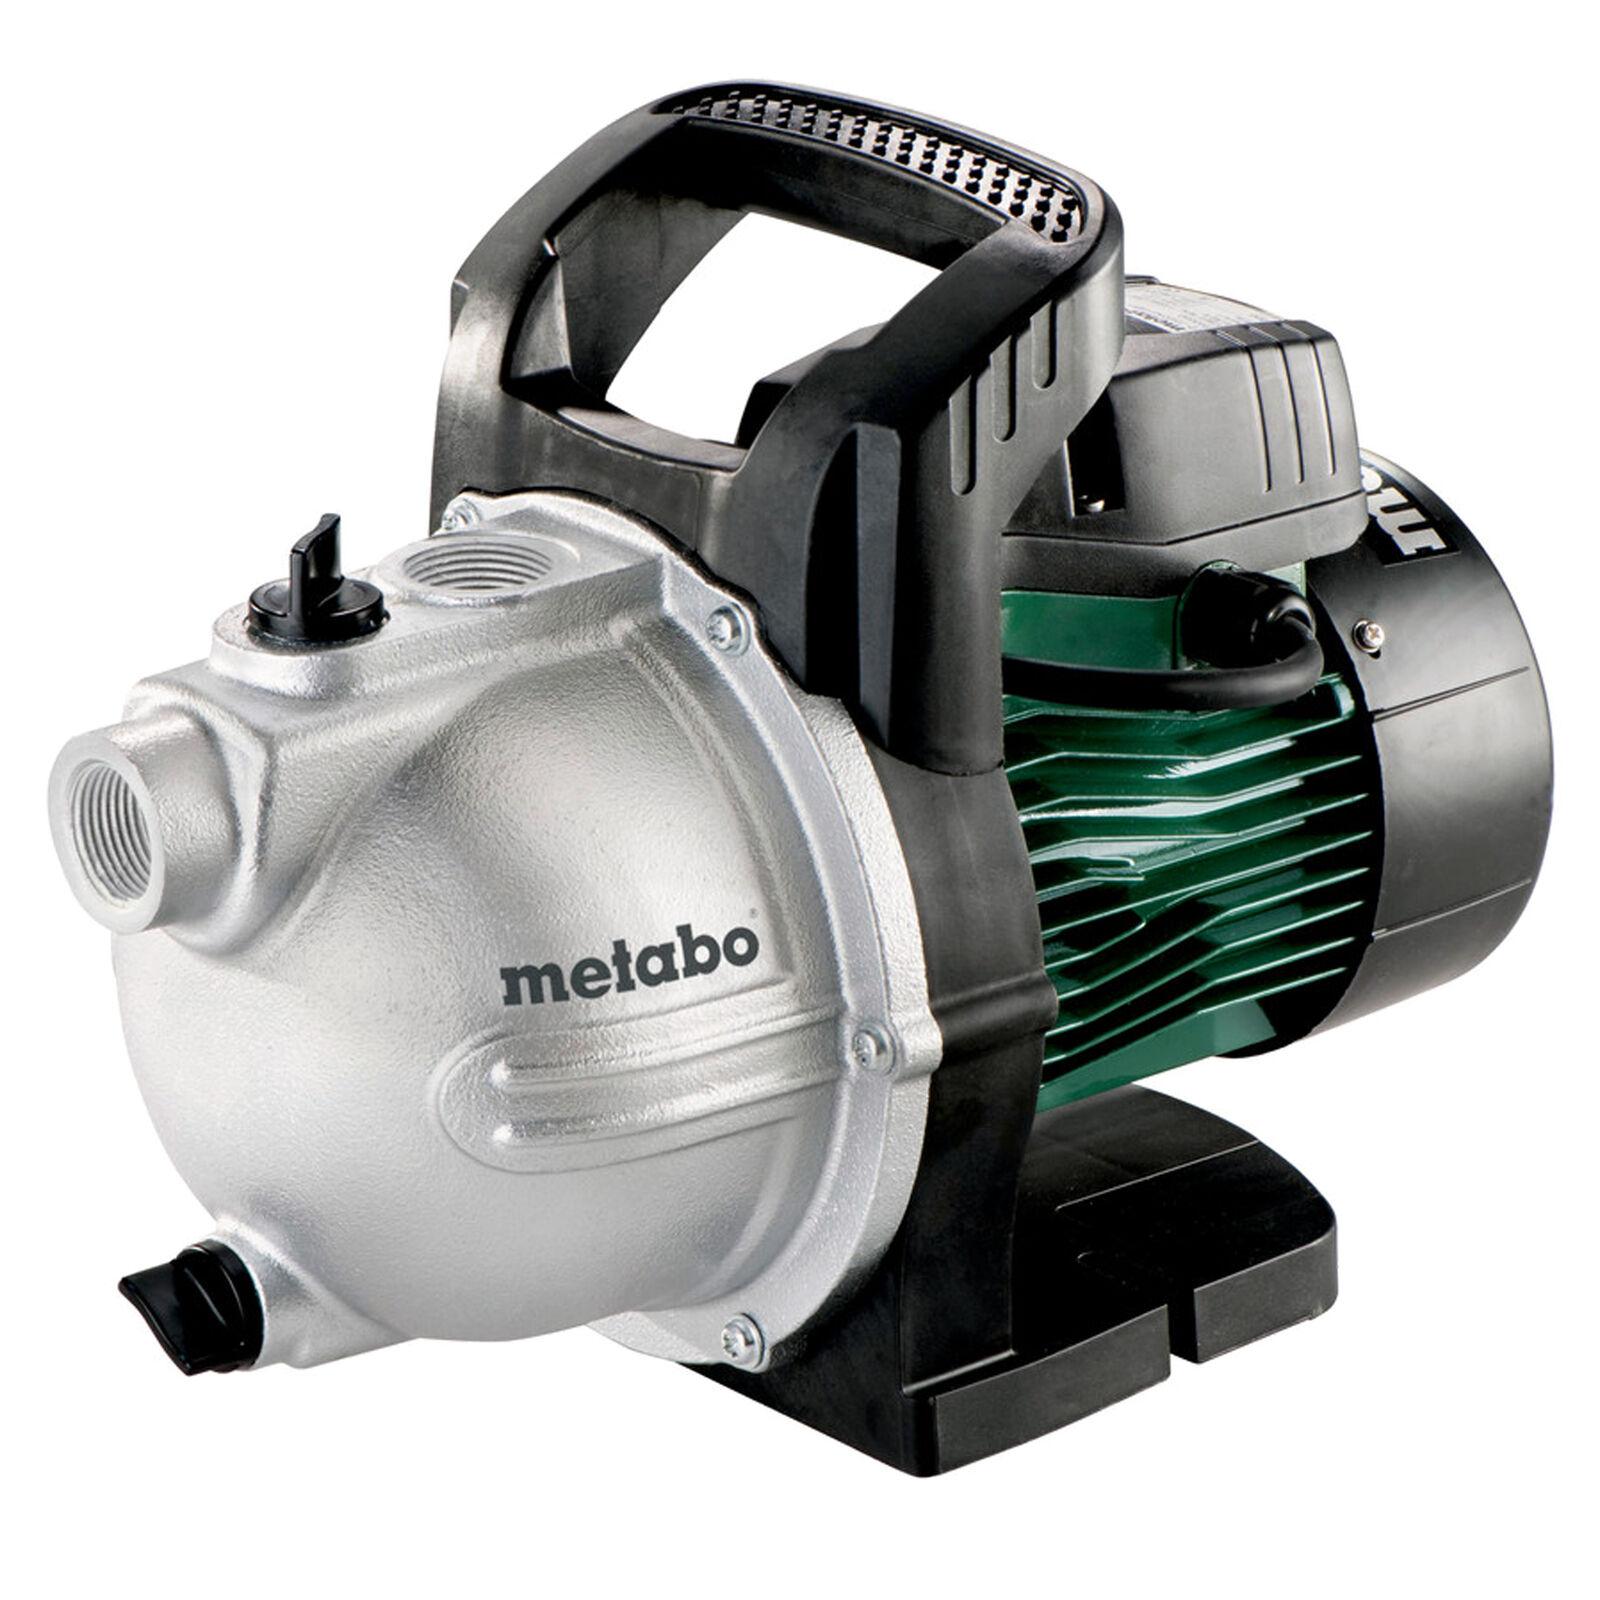 Metabo Gartenpumpe P 3300 G im Karton